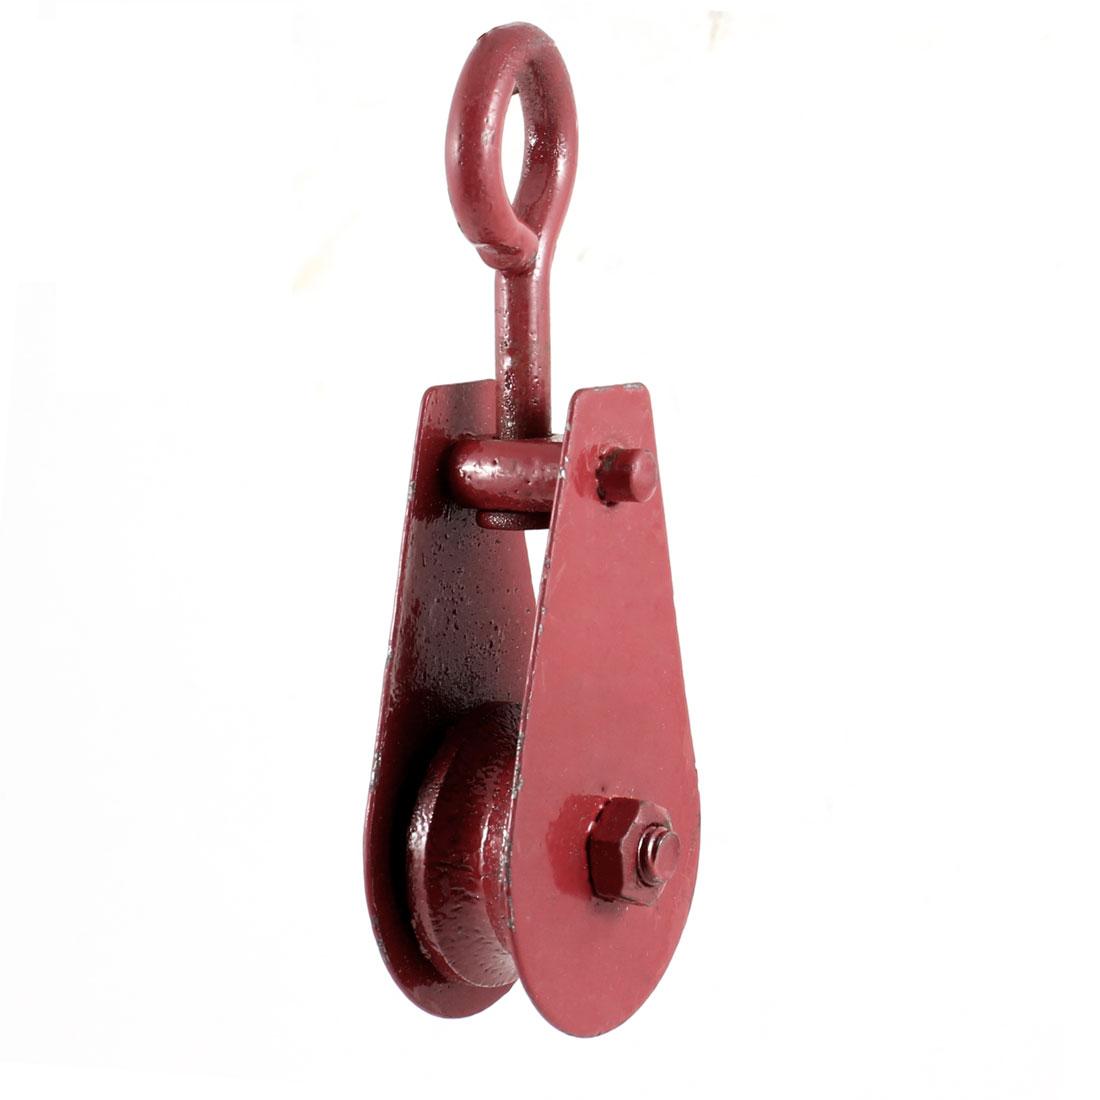 Hoisting Tool 0.1T 100kg 220.4Lbs Lifting Red Metal Crane Pulley Block